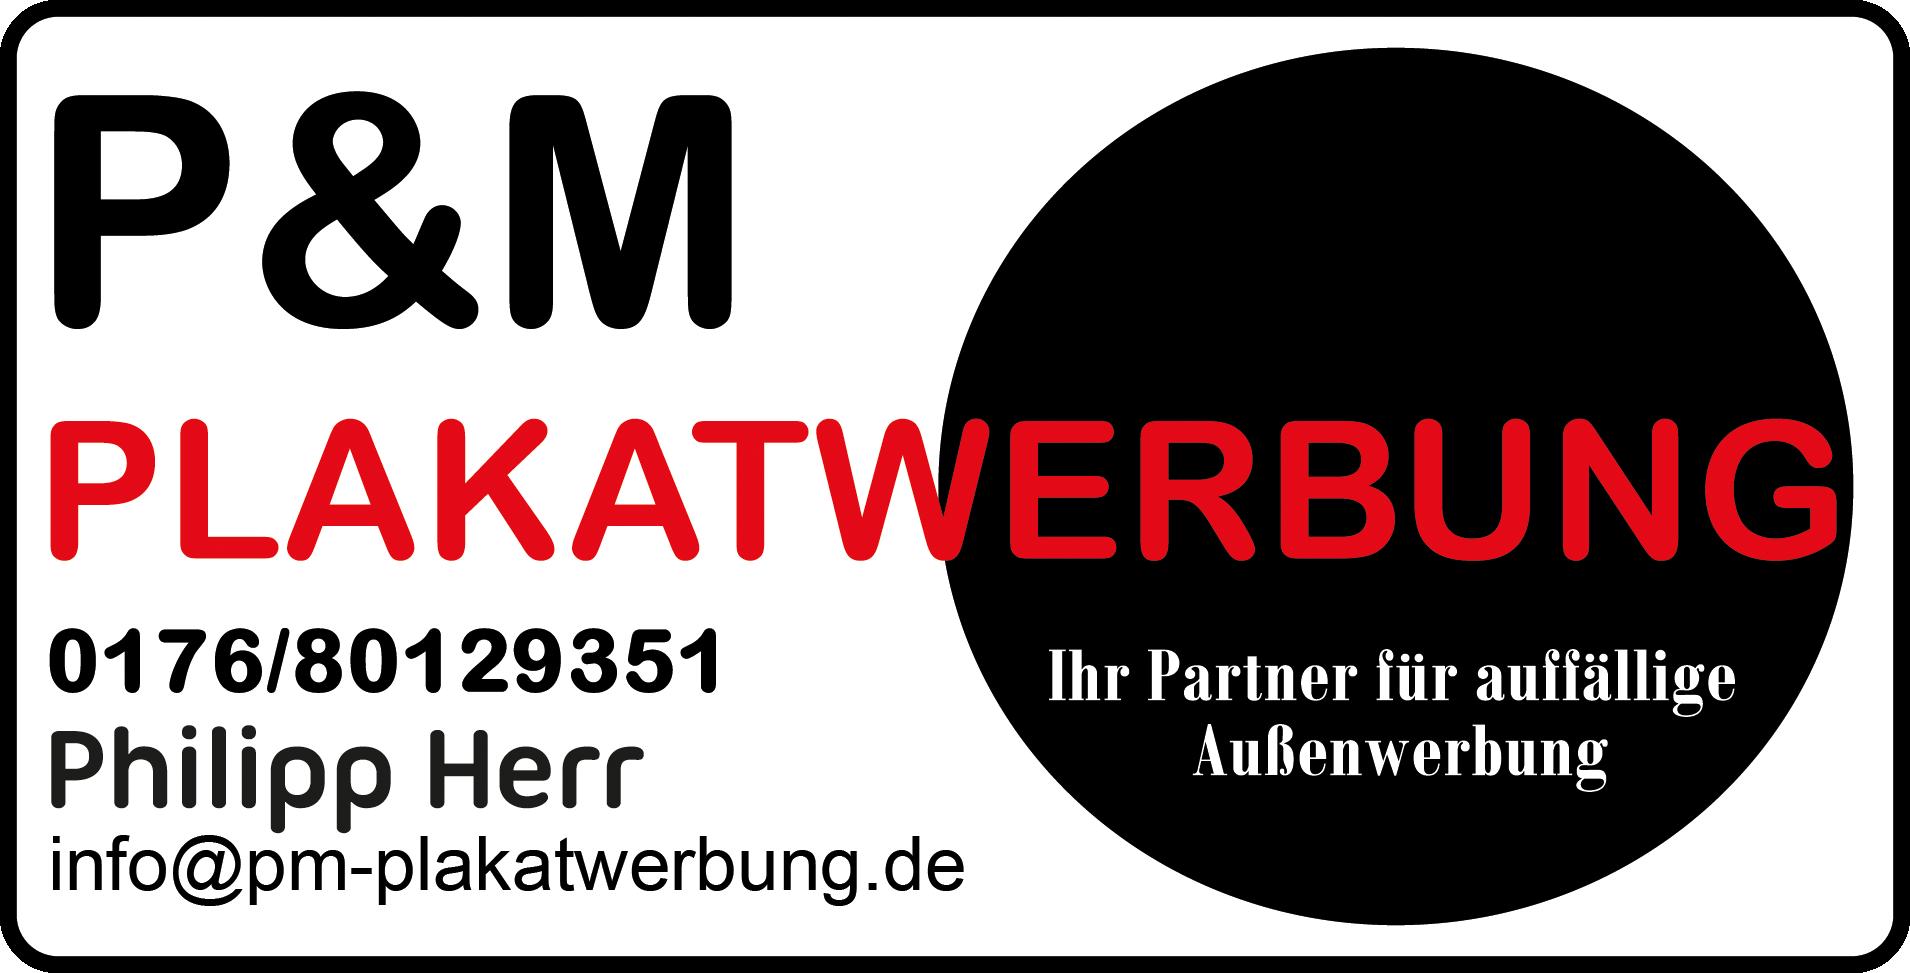 p m plakatwerbung au enwerbung plakatwerbung in offenburg und umgebung. Black Bedroom Furniture Sets. Home Design Ideas